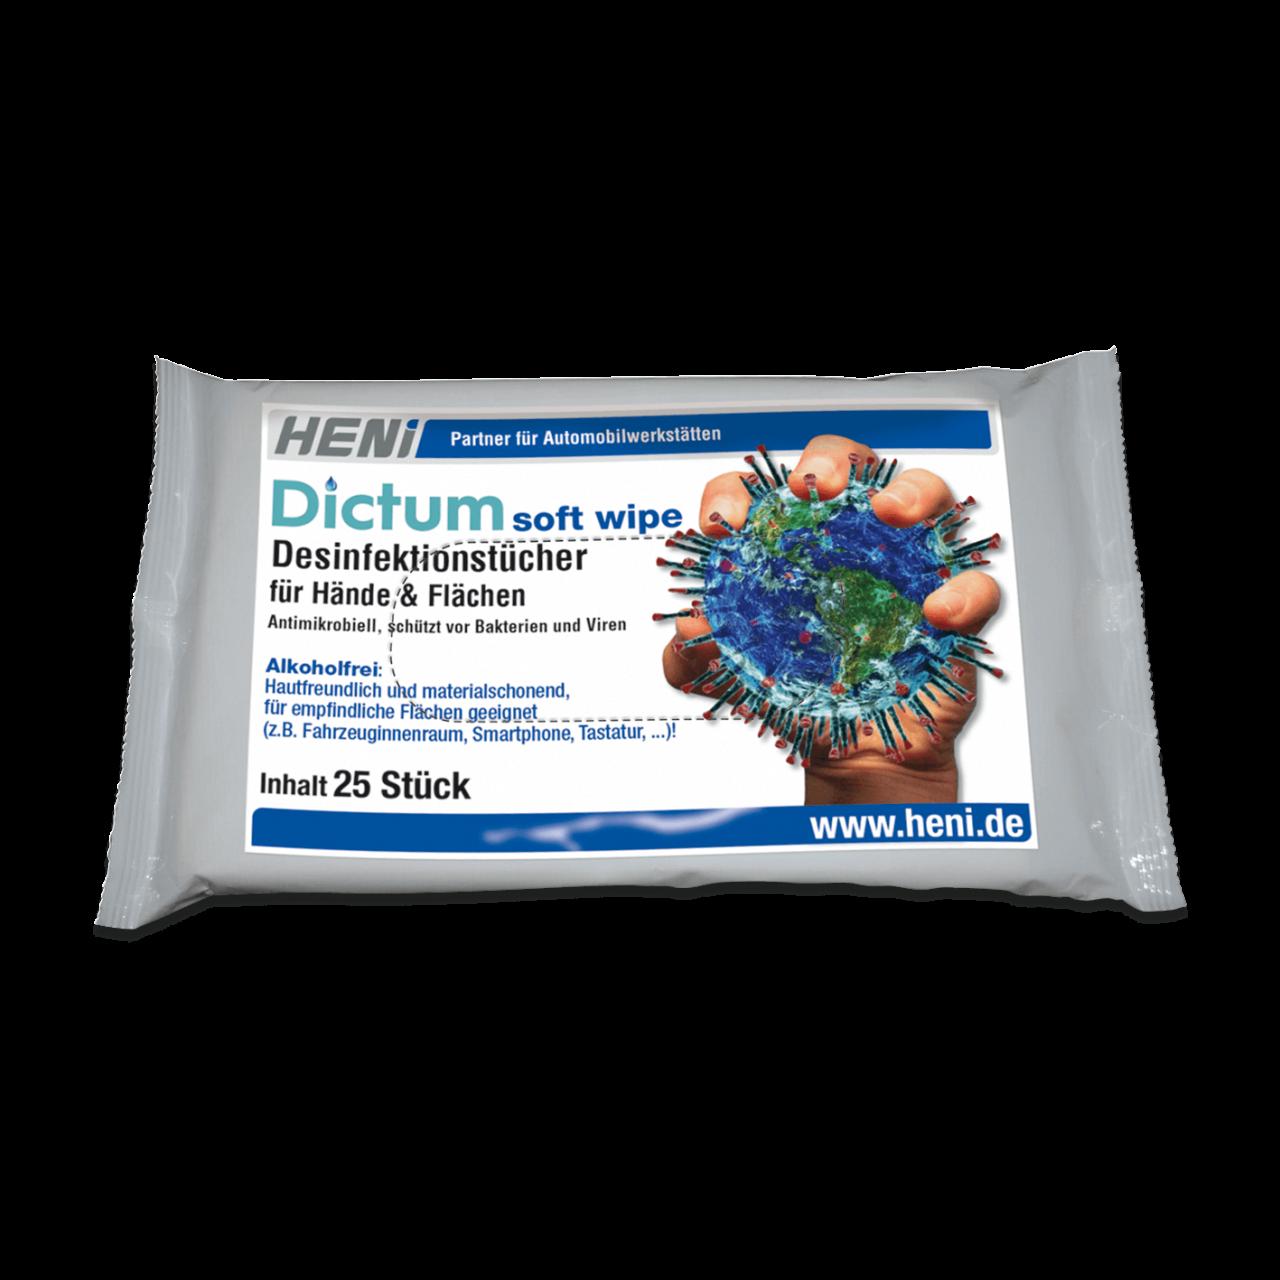 Desinfektionstücher Dictum soft-wipe (MB 6)